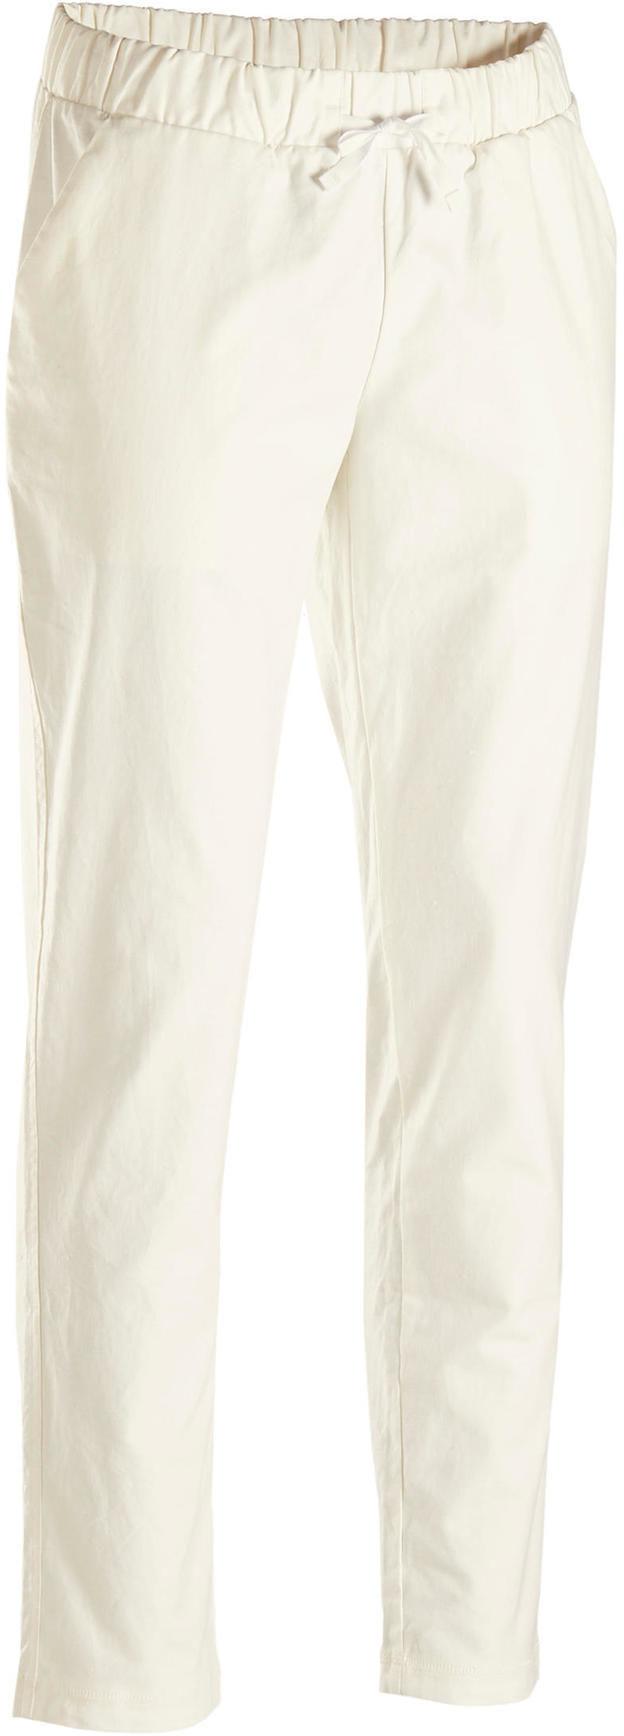 Spodnie do jogi męskie